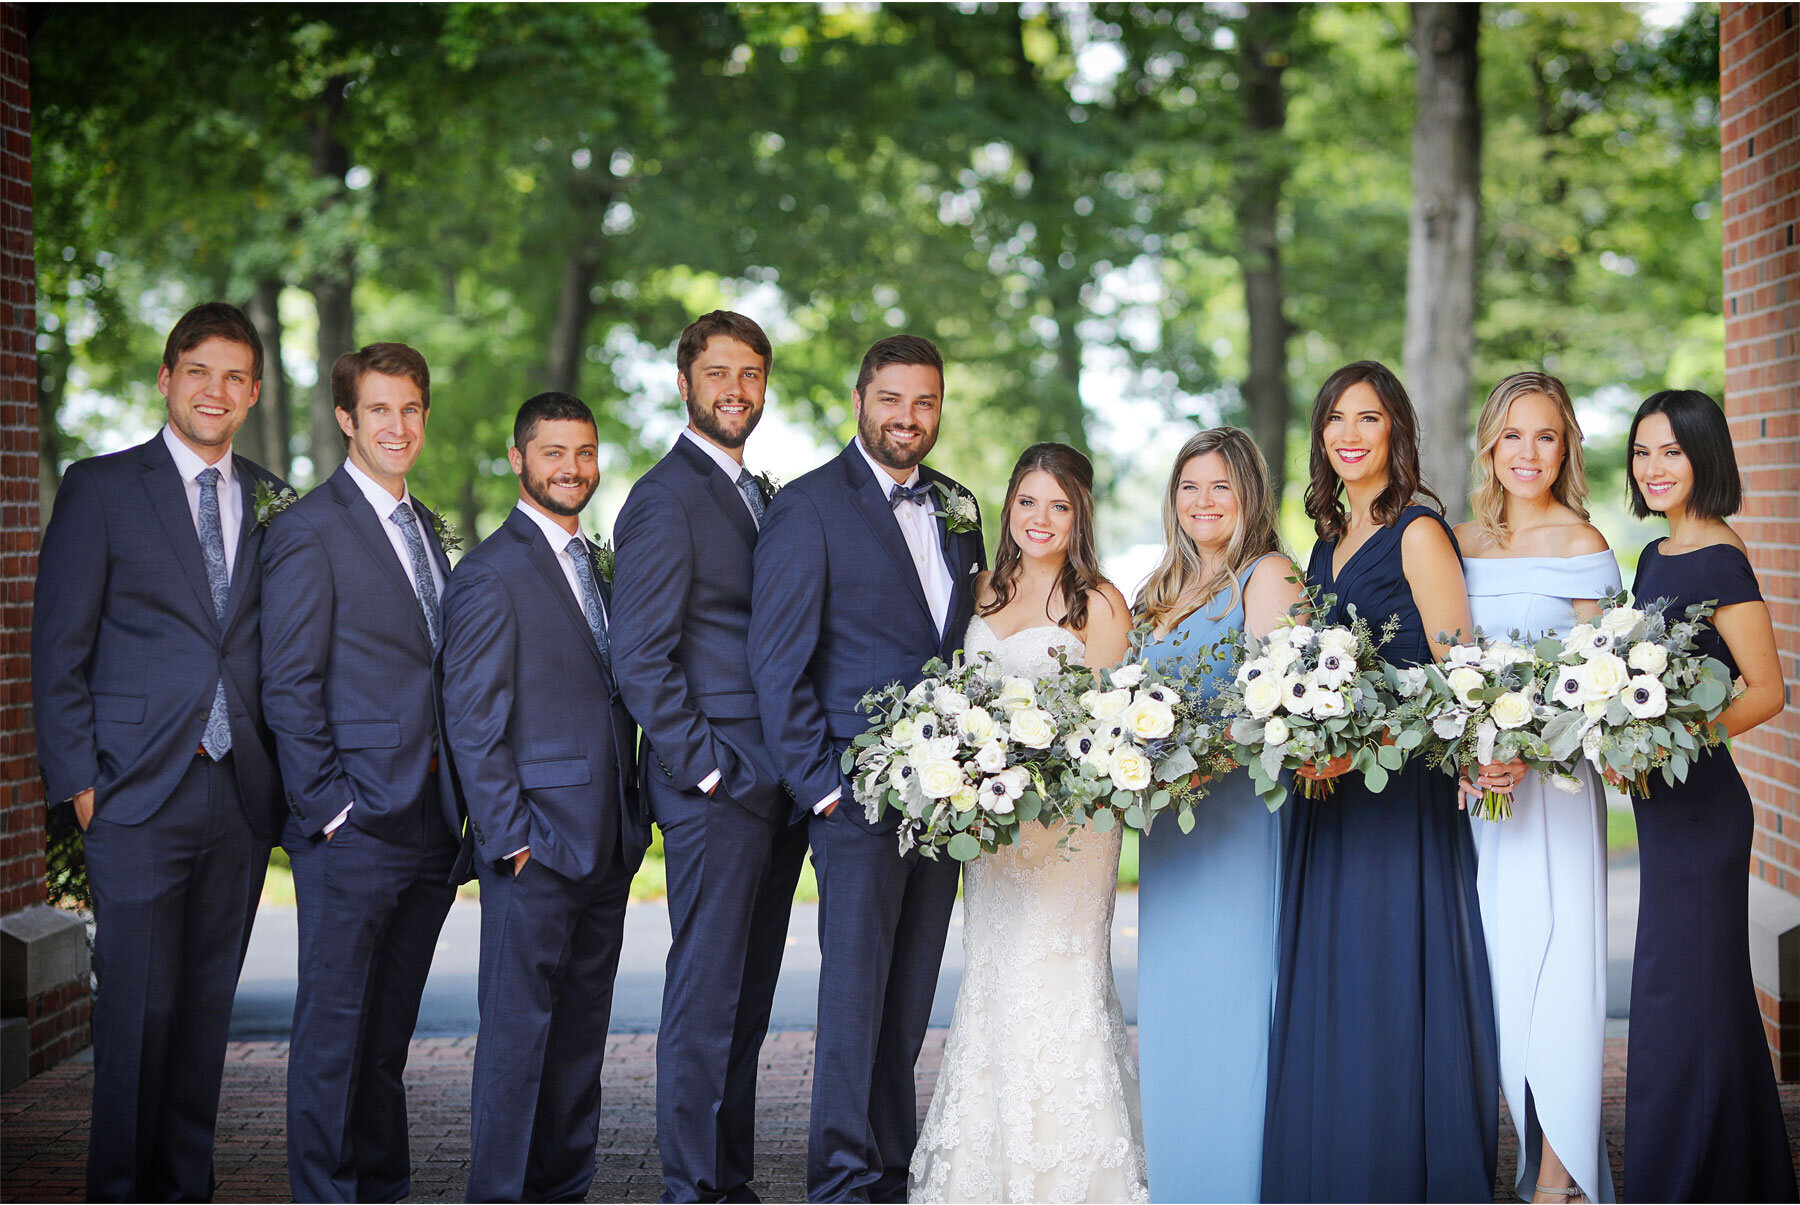 10-Vick-Photography-Wedding-Minnetonka-Minnesota-Lafayette-Club-Bridesmaids-Groomsmen-Katie-and-David.jpg